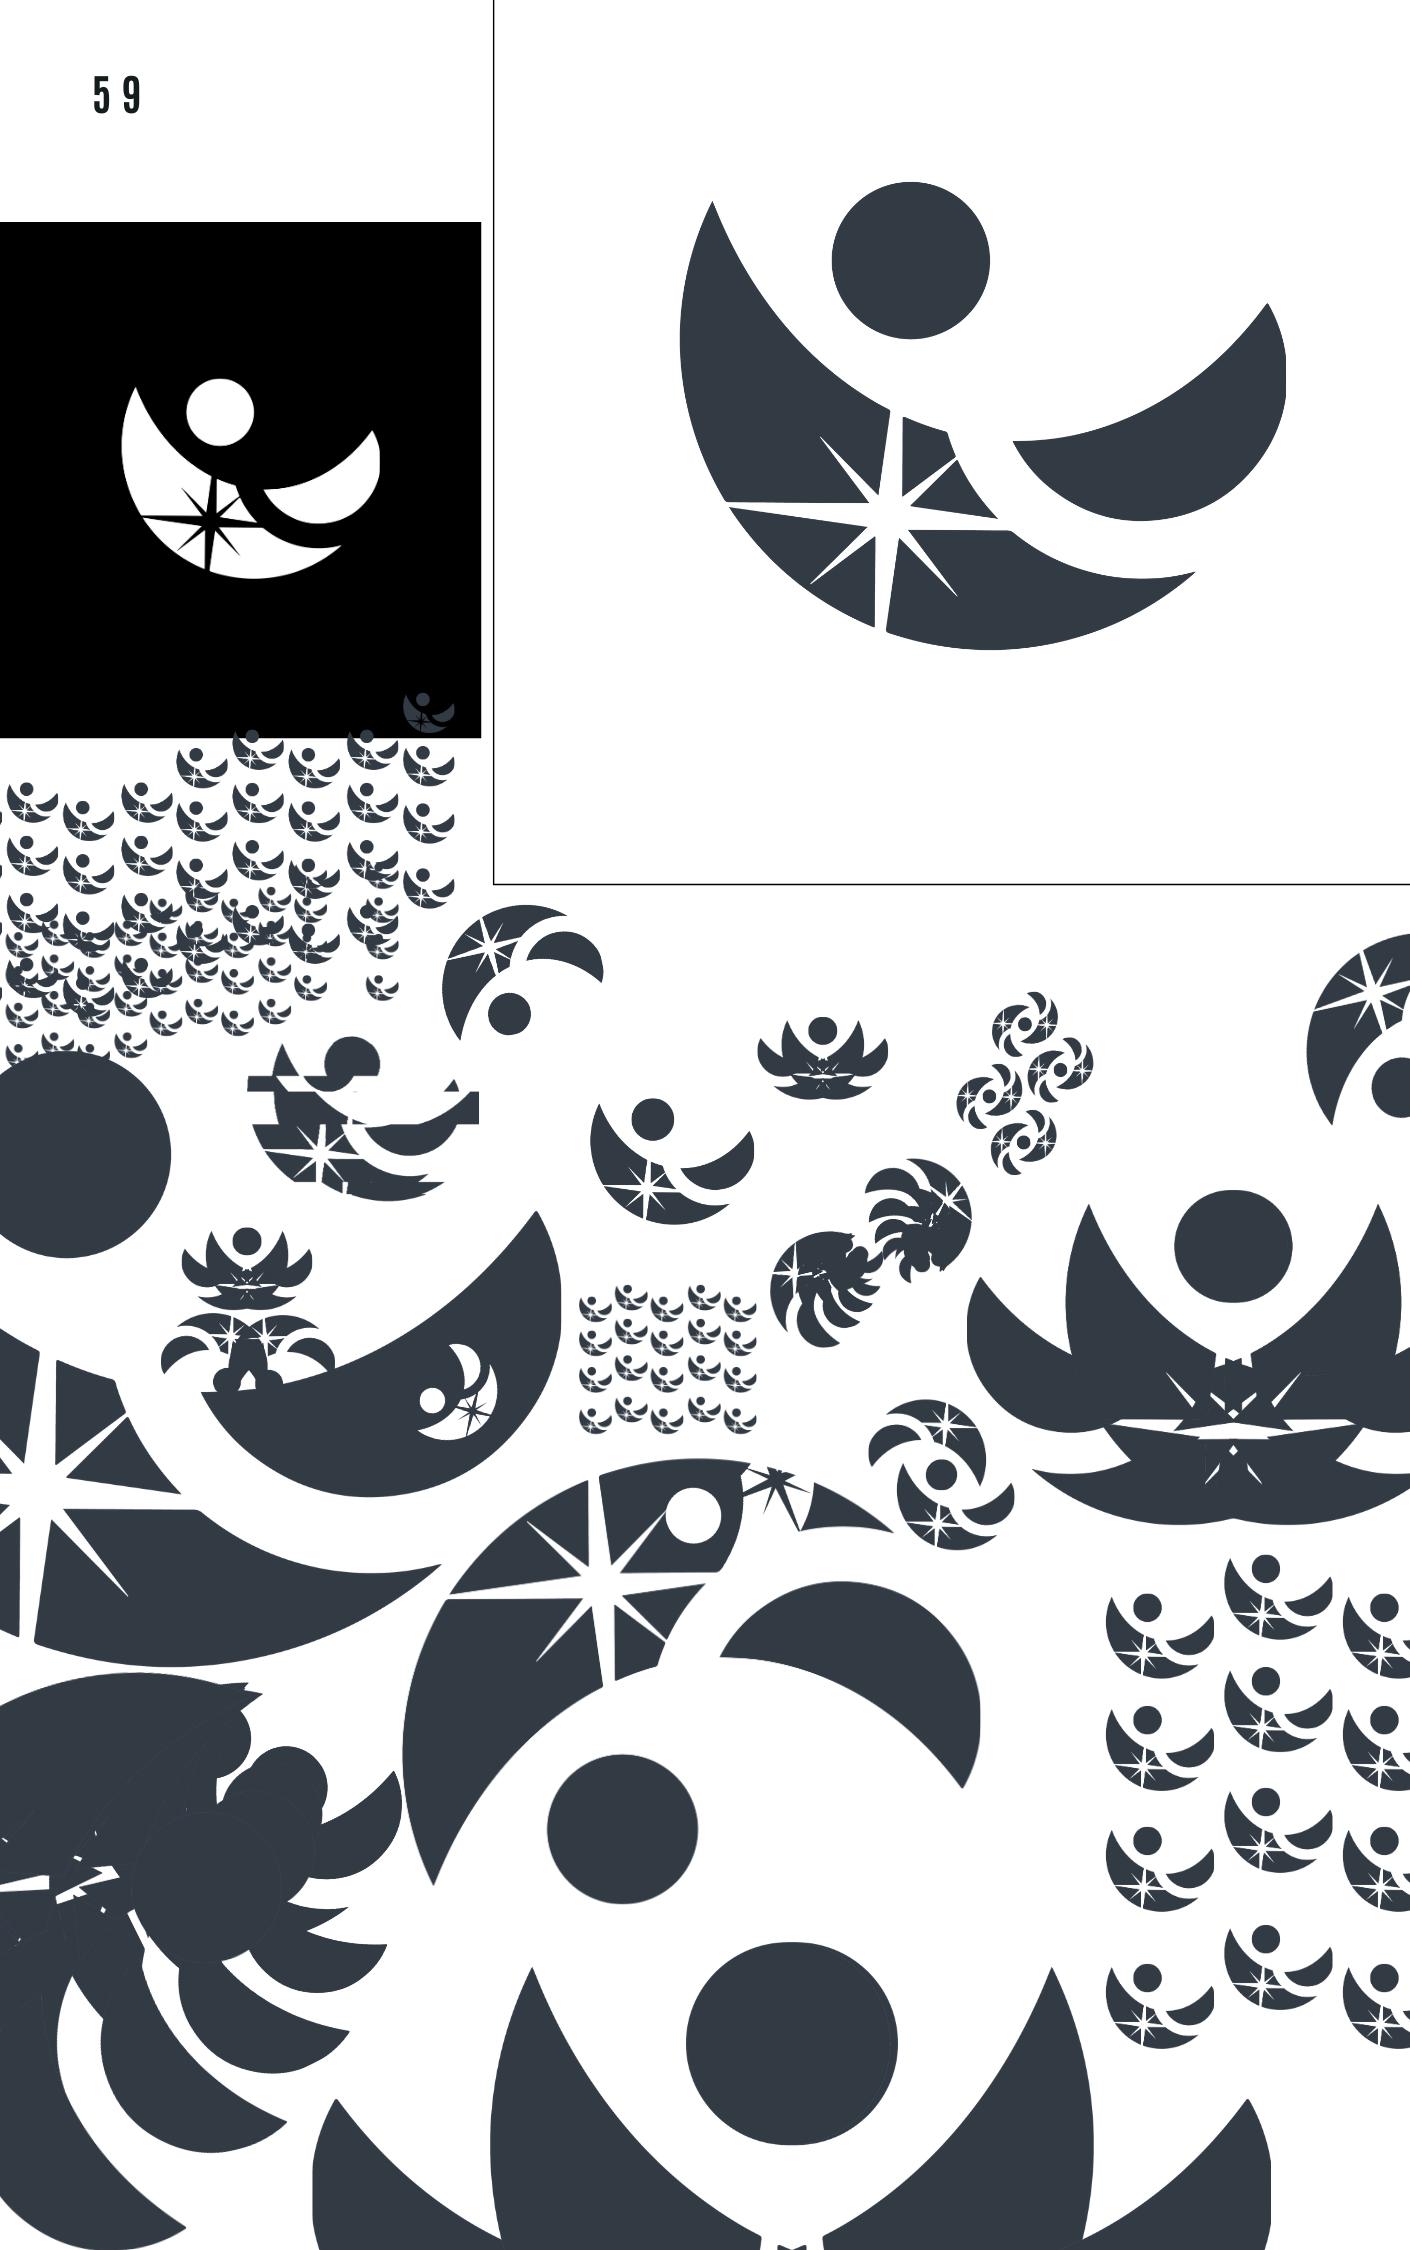 A sample of logos design by Owl Street Studio